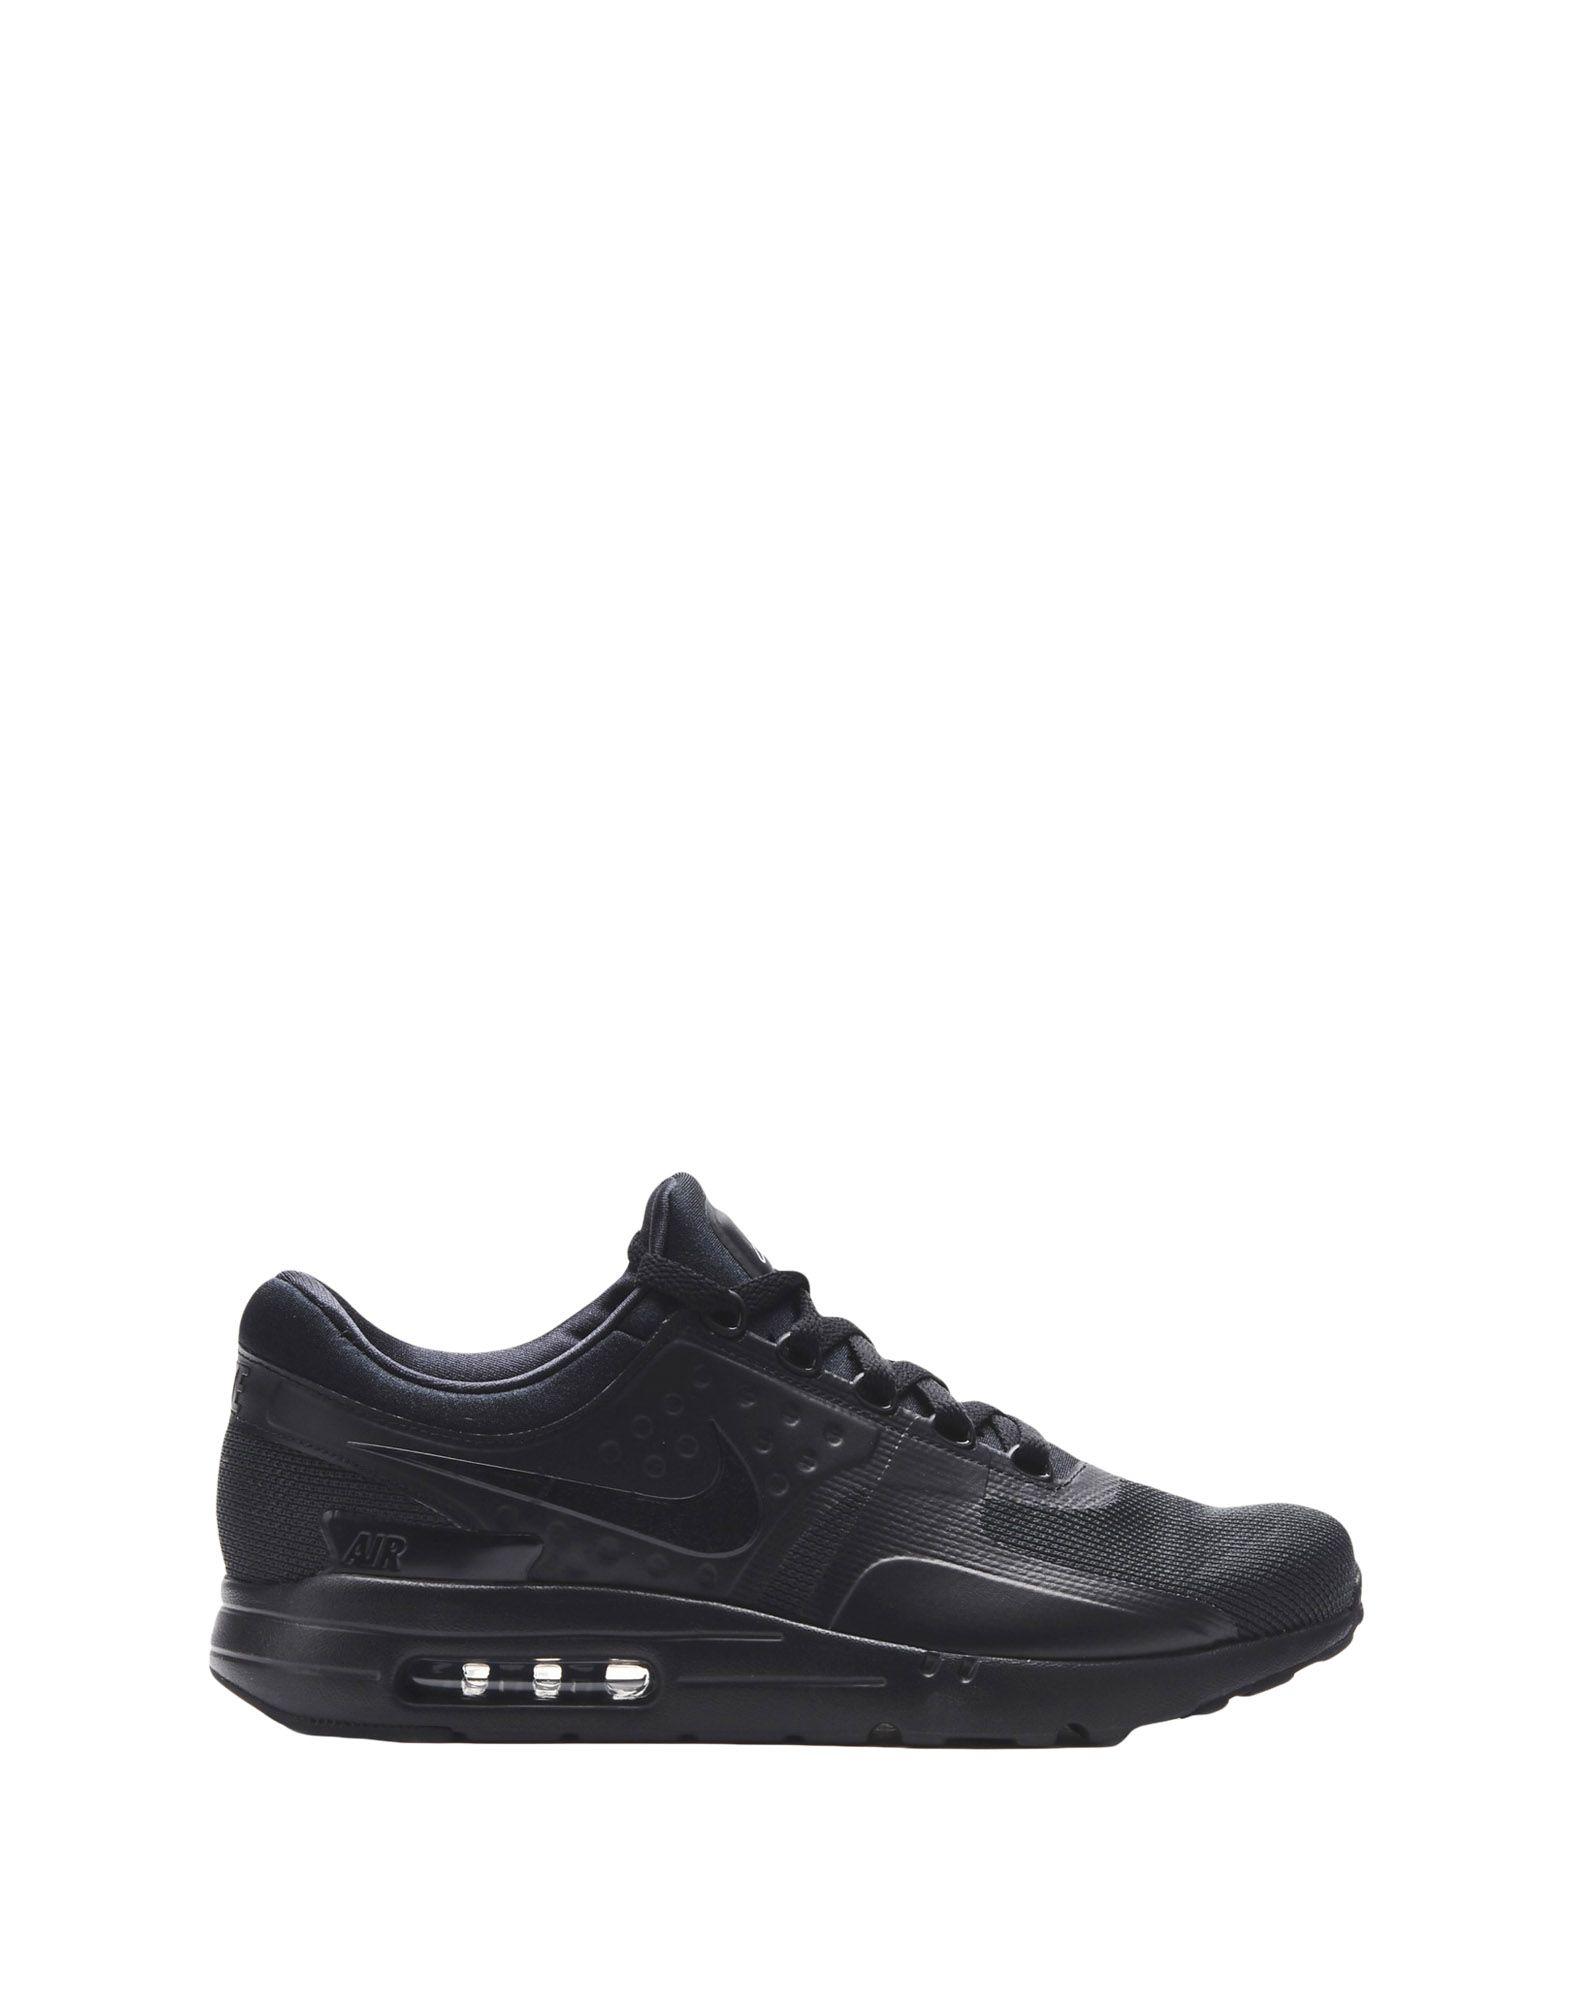 Nike  Air Max Zero Essential  11243660CW Gute Qualität beliebte Schuhe